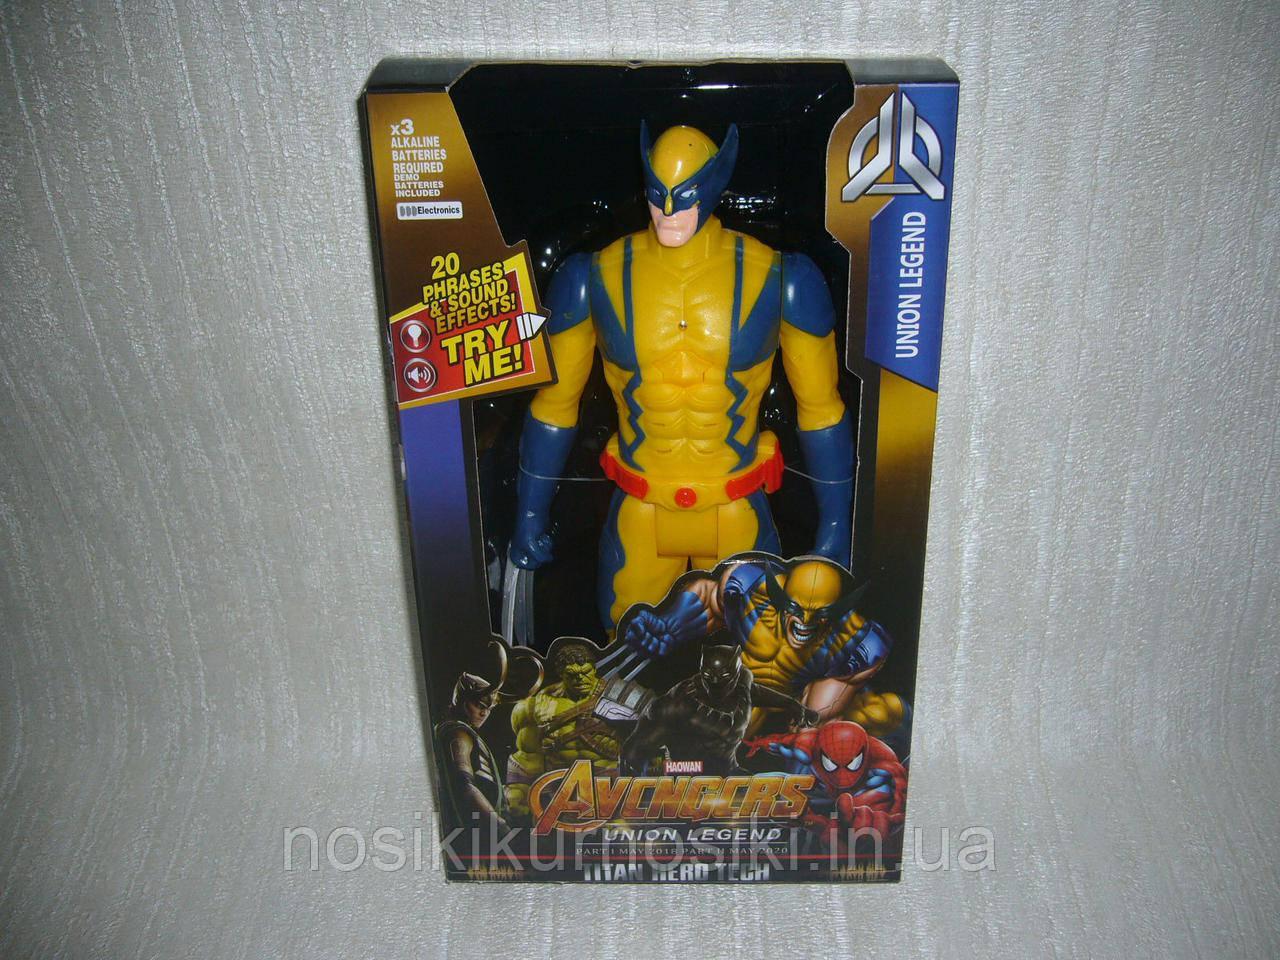 Супергерой Росомаха (Логан, Wolverine) Titan Hero Tech